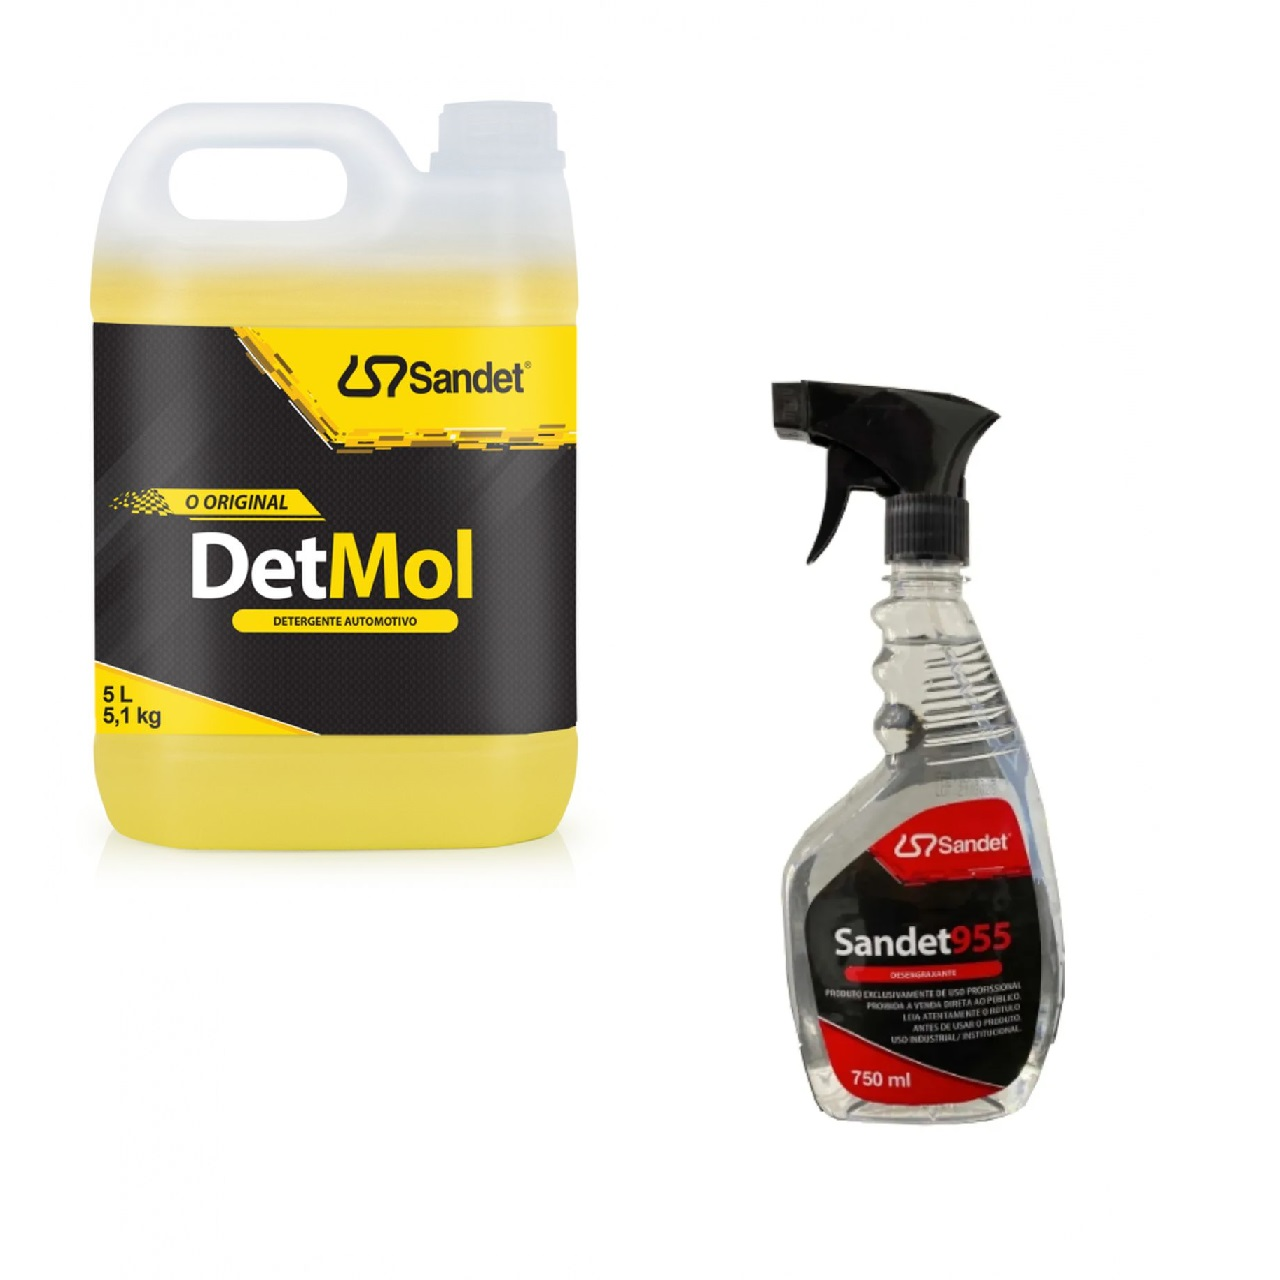 Combo Lava Moto Shampoo Detmol 5L +  Desengraxante Sandet